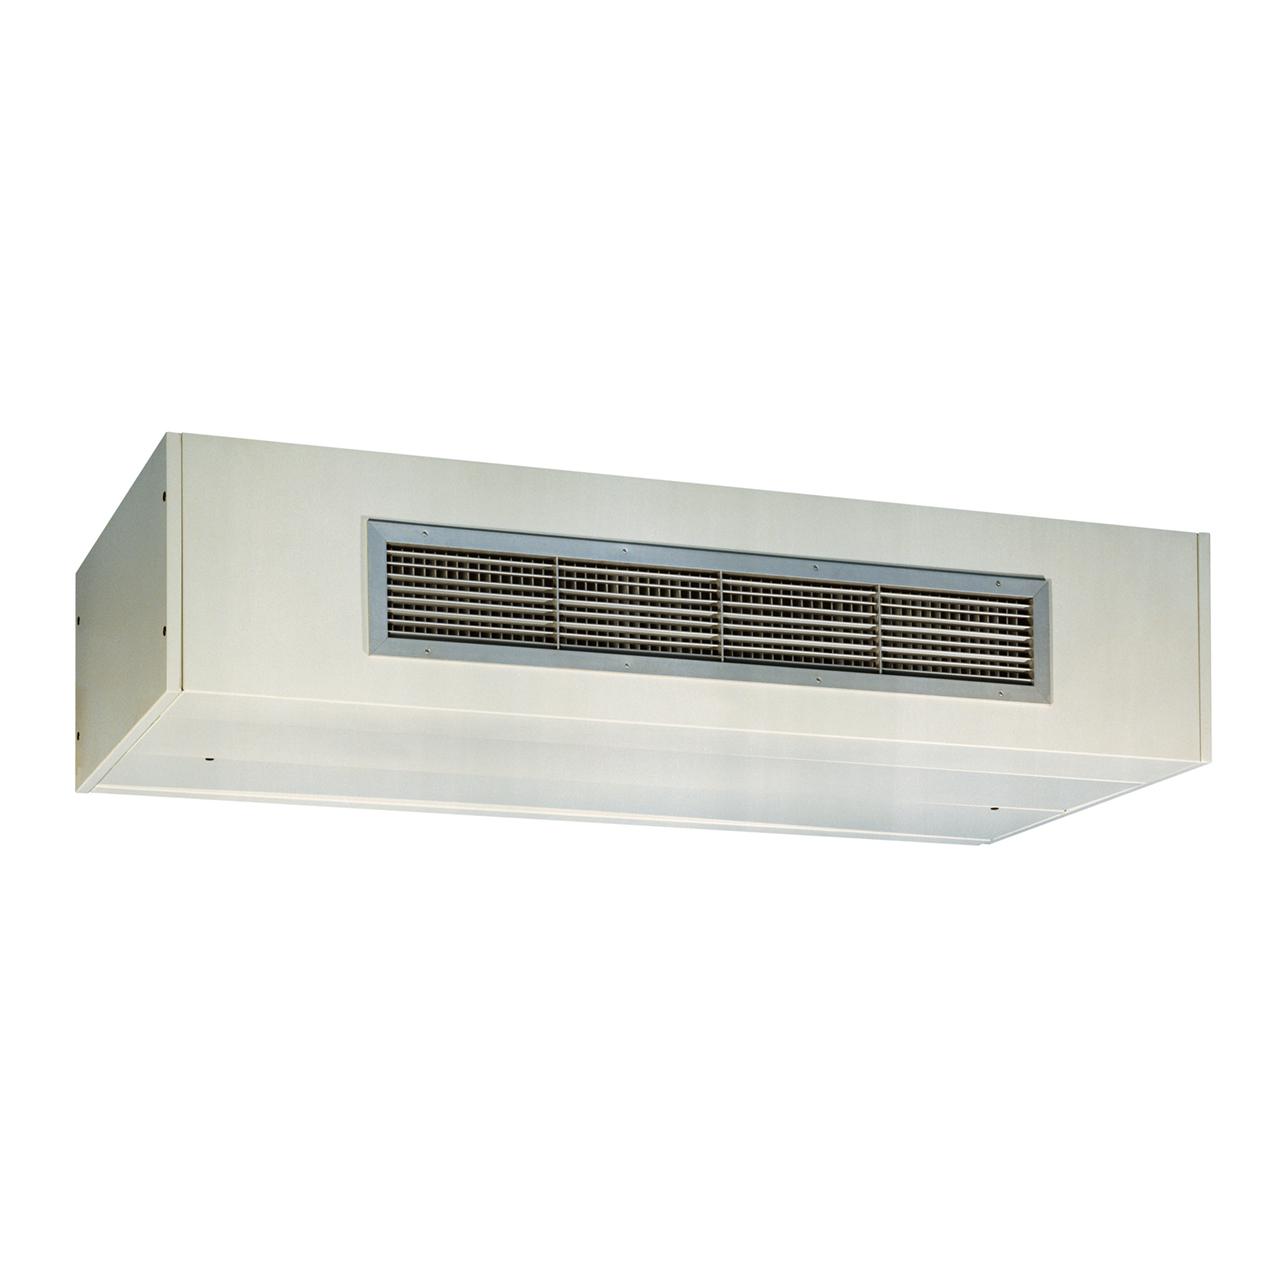 carrier-40UH-horizontal-unit-ventilator